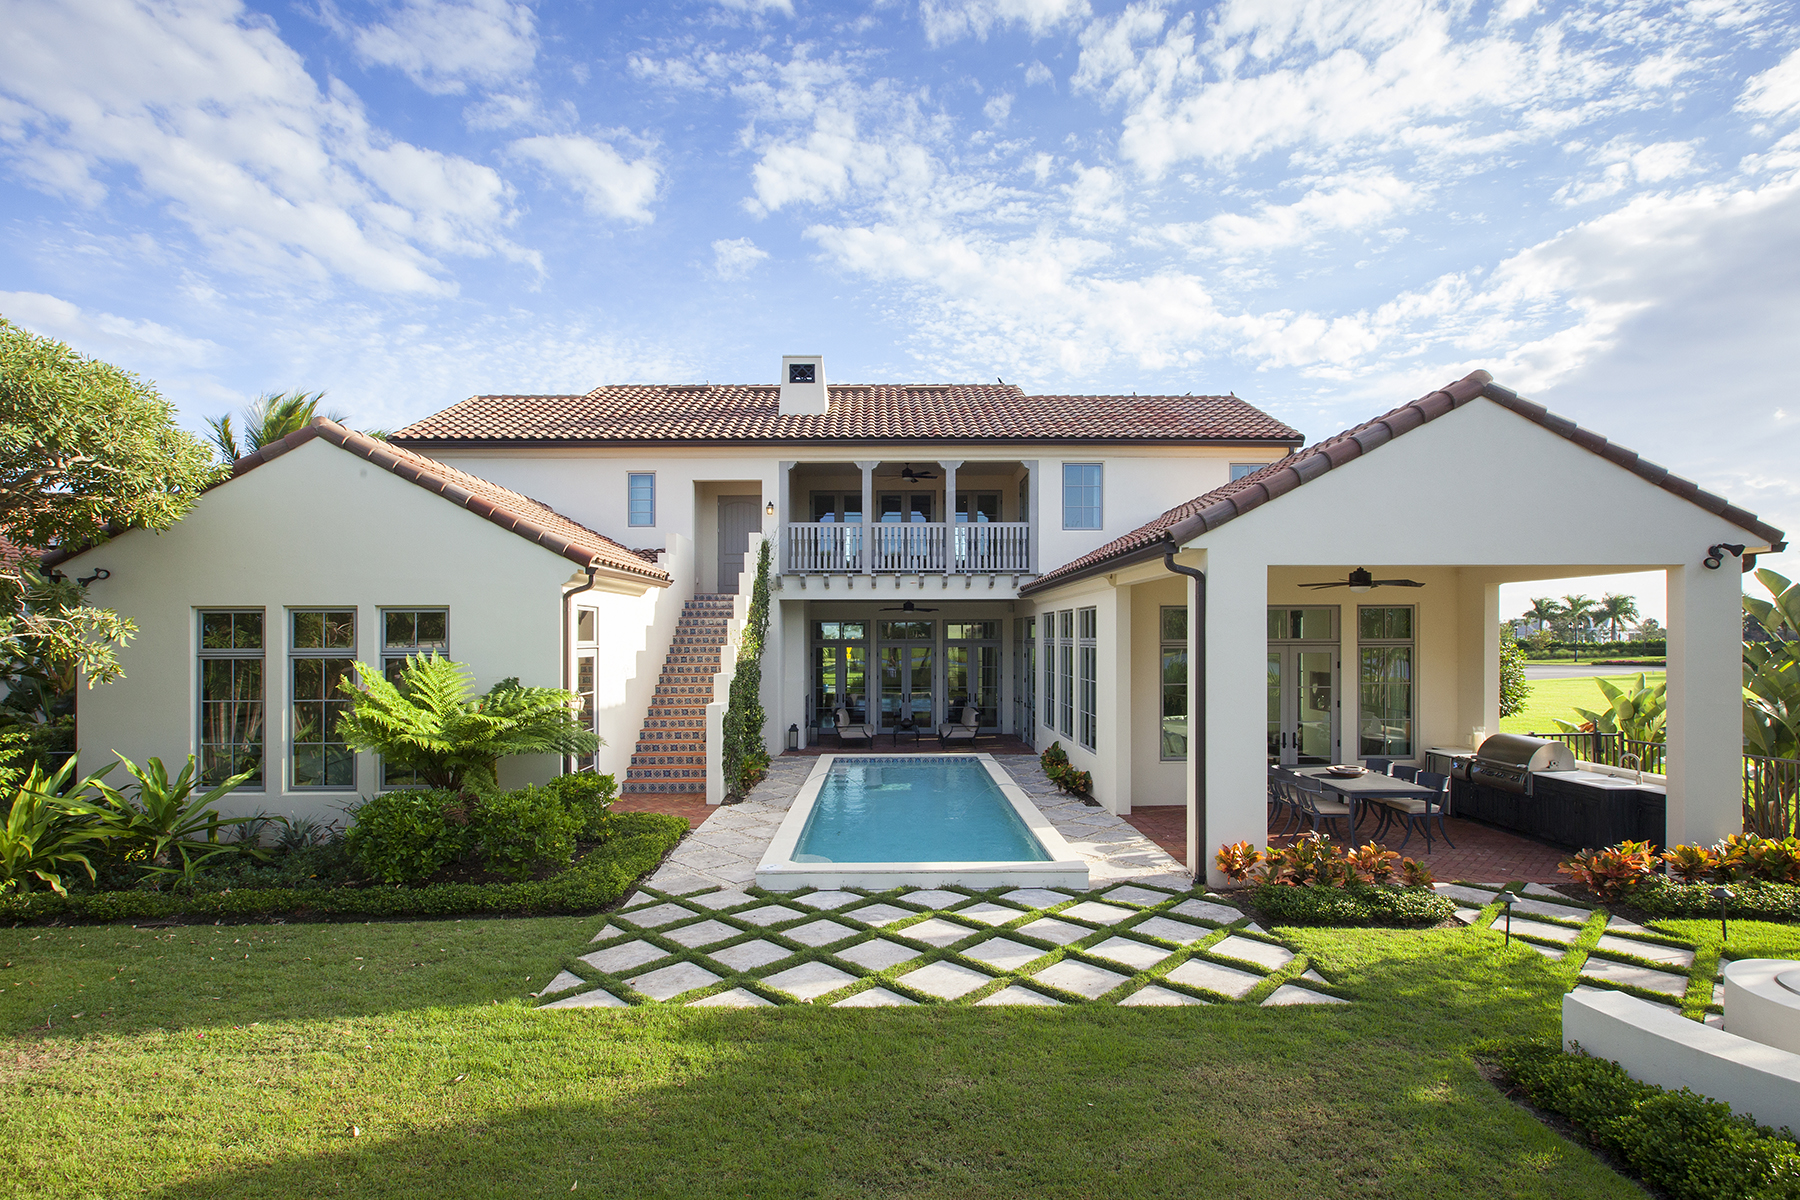 Single Family Home for Sale at FIDDLER'S CREEK - MARSH COVE 3259 Tavolara Ln, Naples, Florida 34114 United States